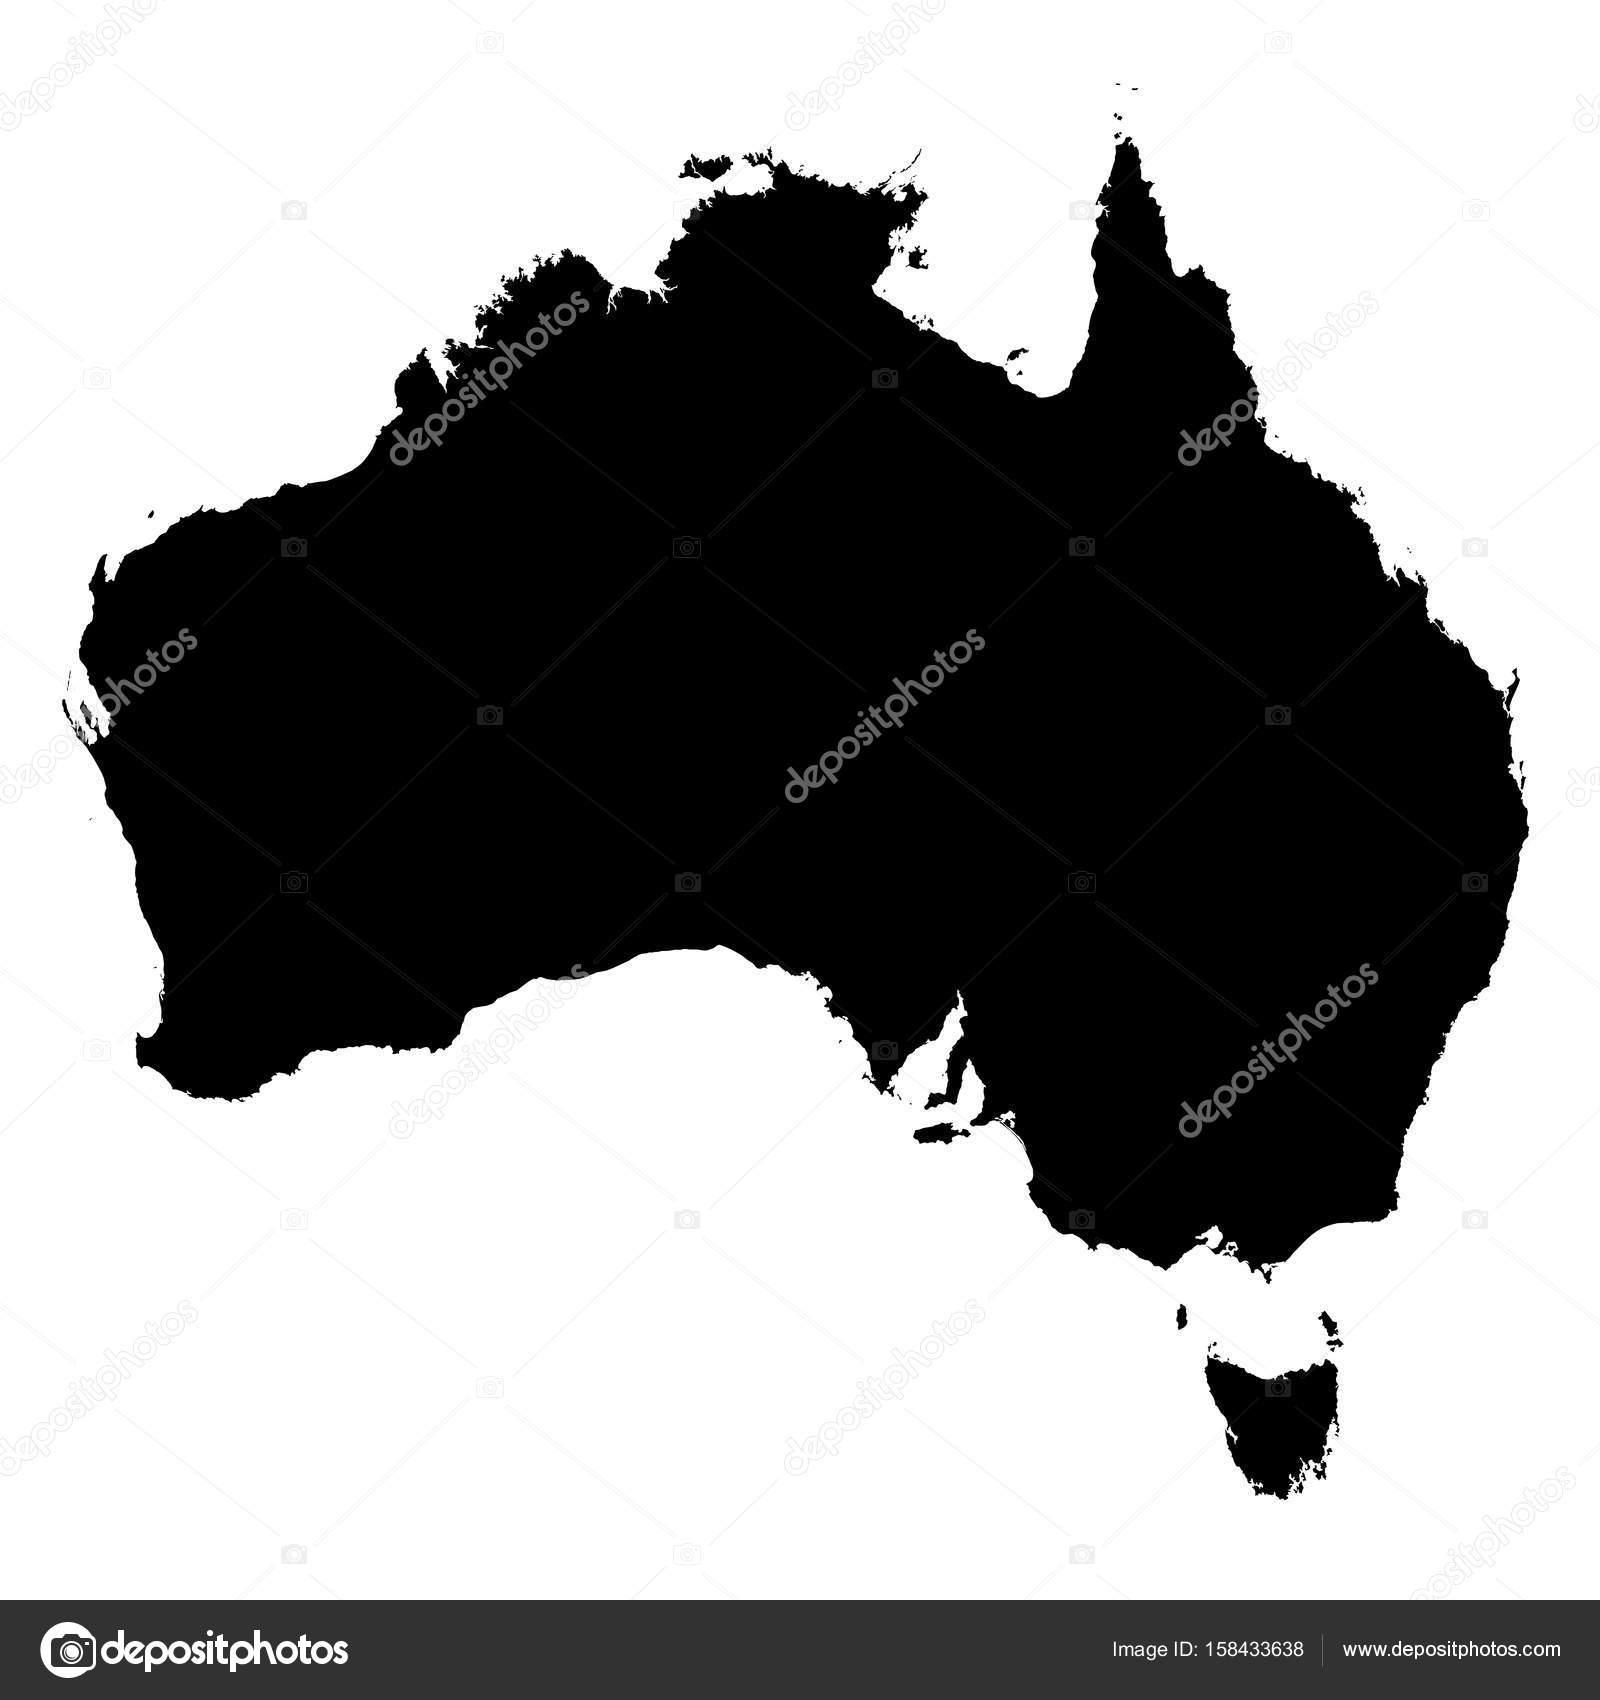 Australia Black Silhouette Map Outline Isolated on White 3D ... on outline map of the uk, outline map of british isles, outline map of oceania, outline map of scandinavia, outline map of northern europe, outline map of eastern europe, outline map of micronesia, outline map of emea, outline map of the americas, outline map of western us, outline map of the pacific rim, outline map of asia, outline map of papua new guinea, outline map of eastern usa,